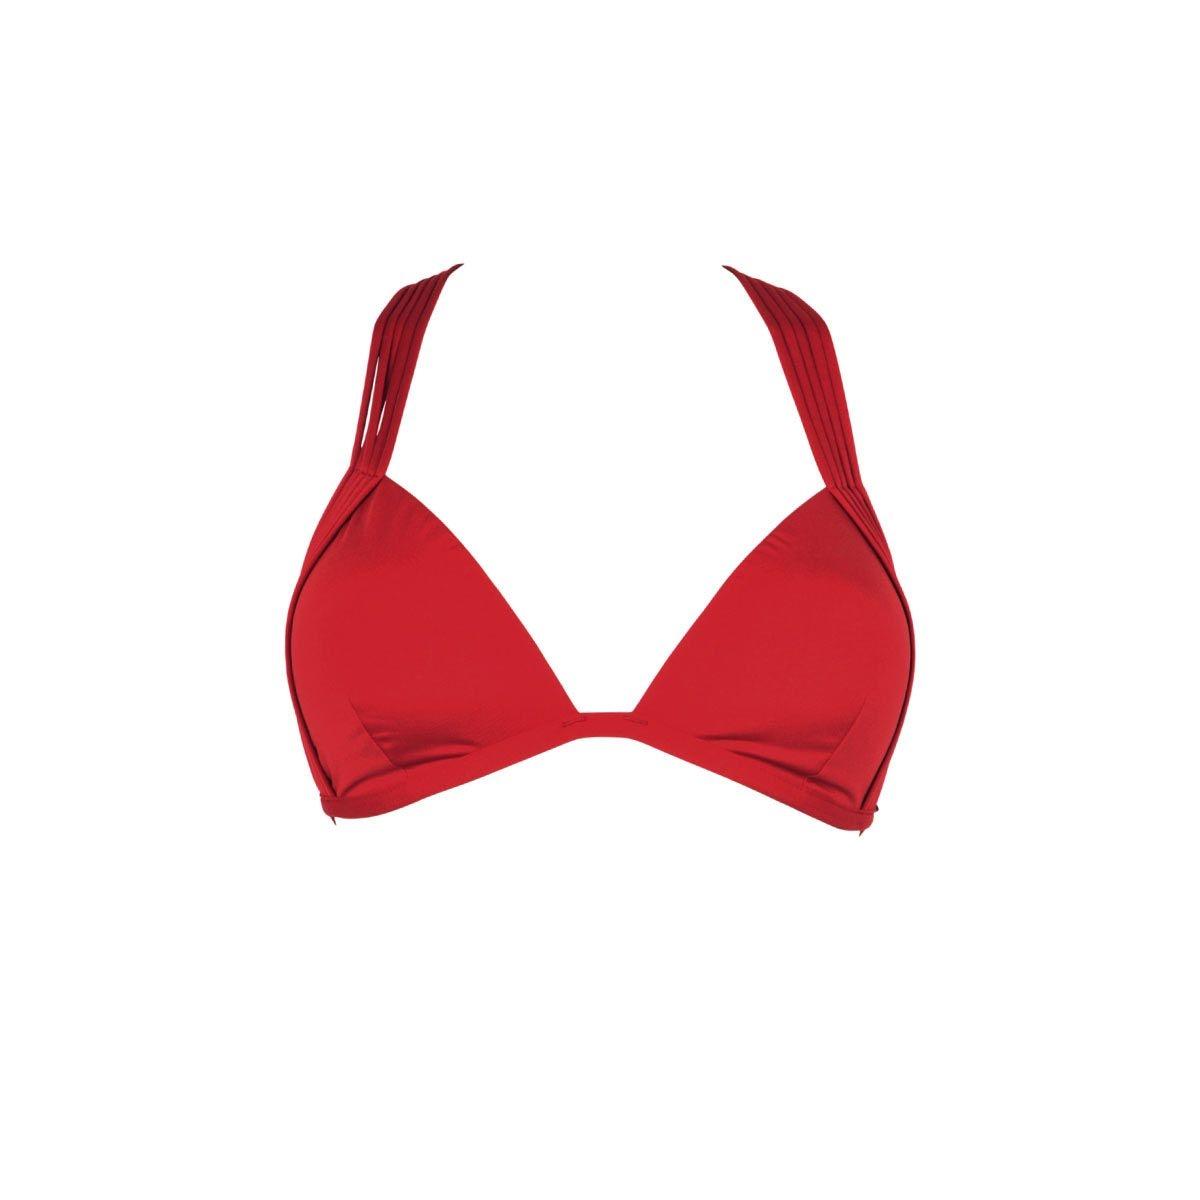 Maillot de bain triangle rouge carmin Indira (Haut)